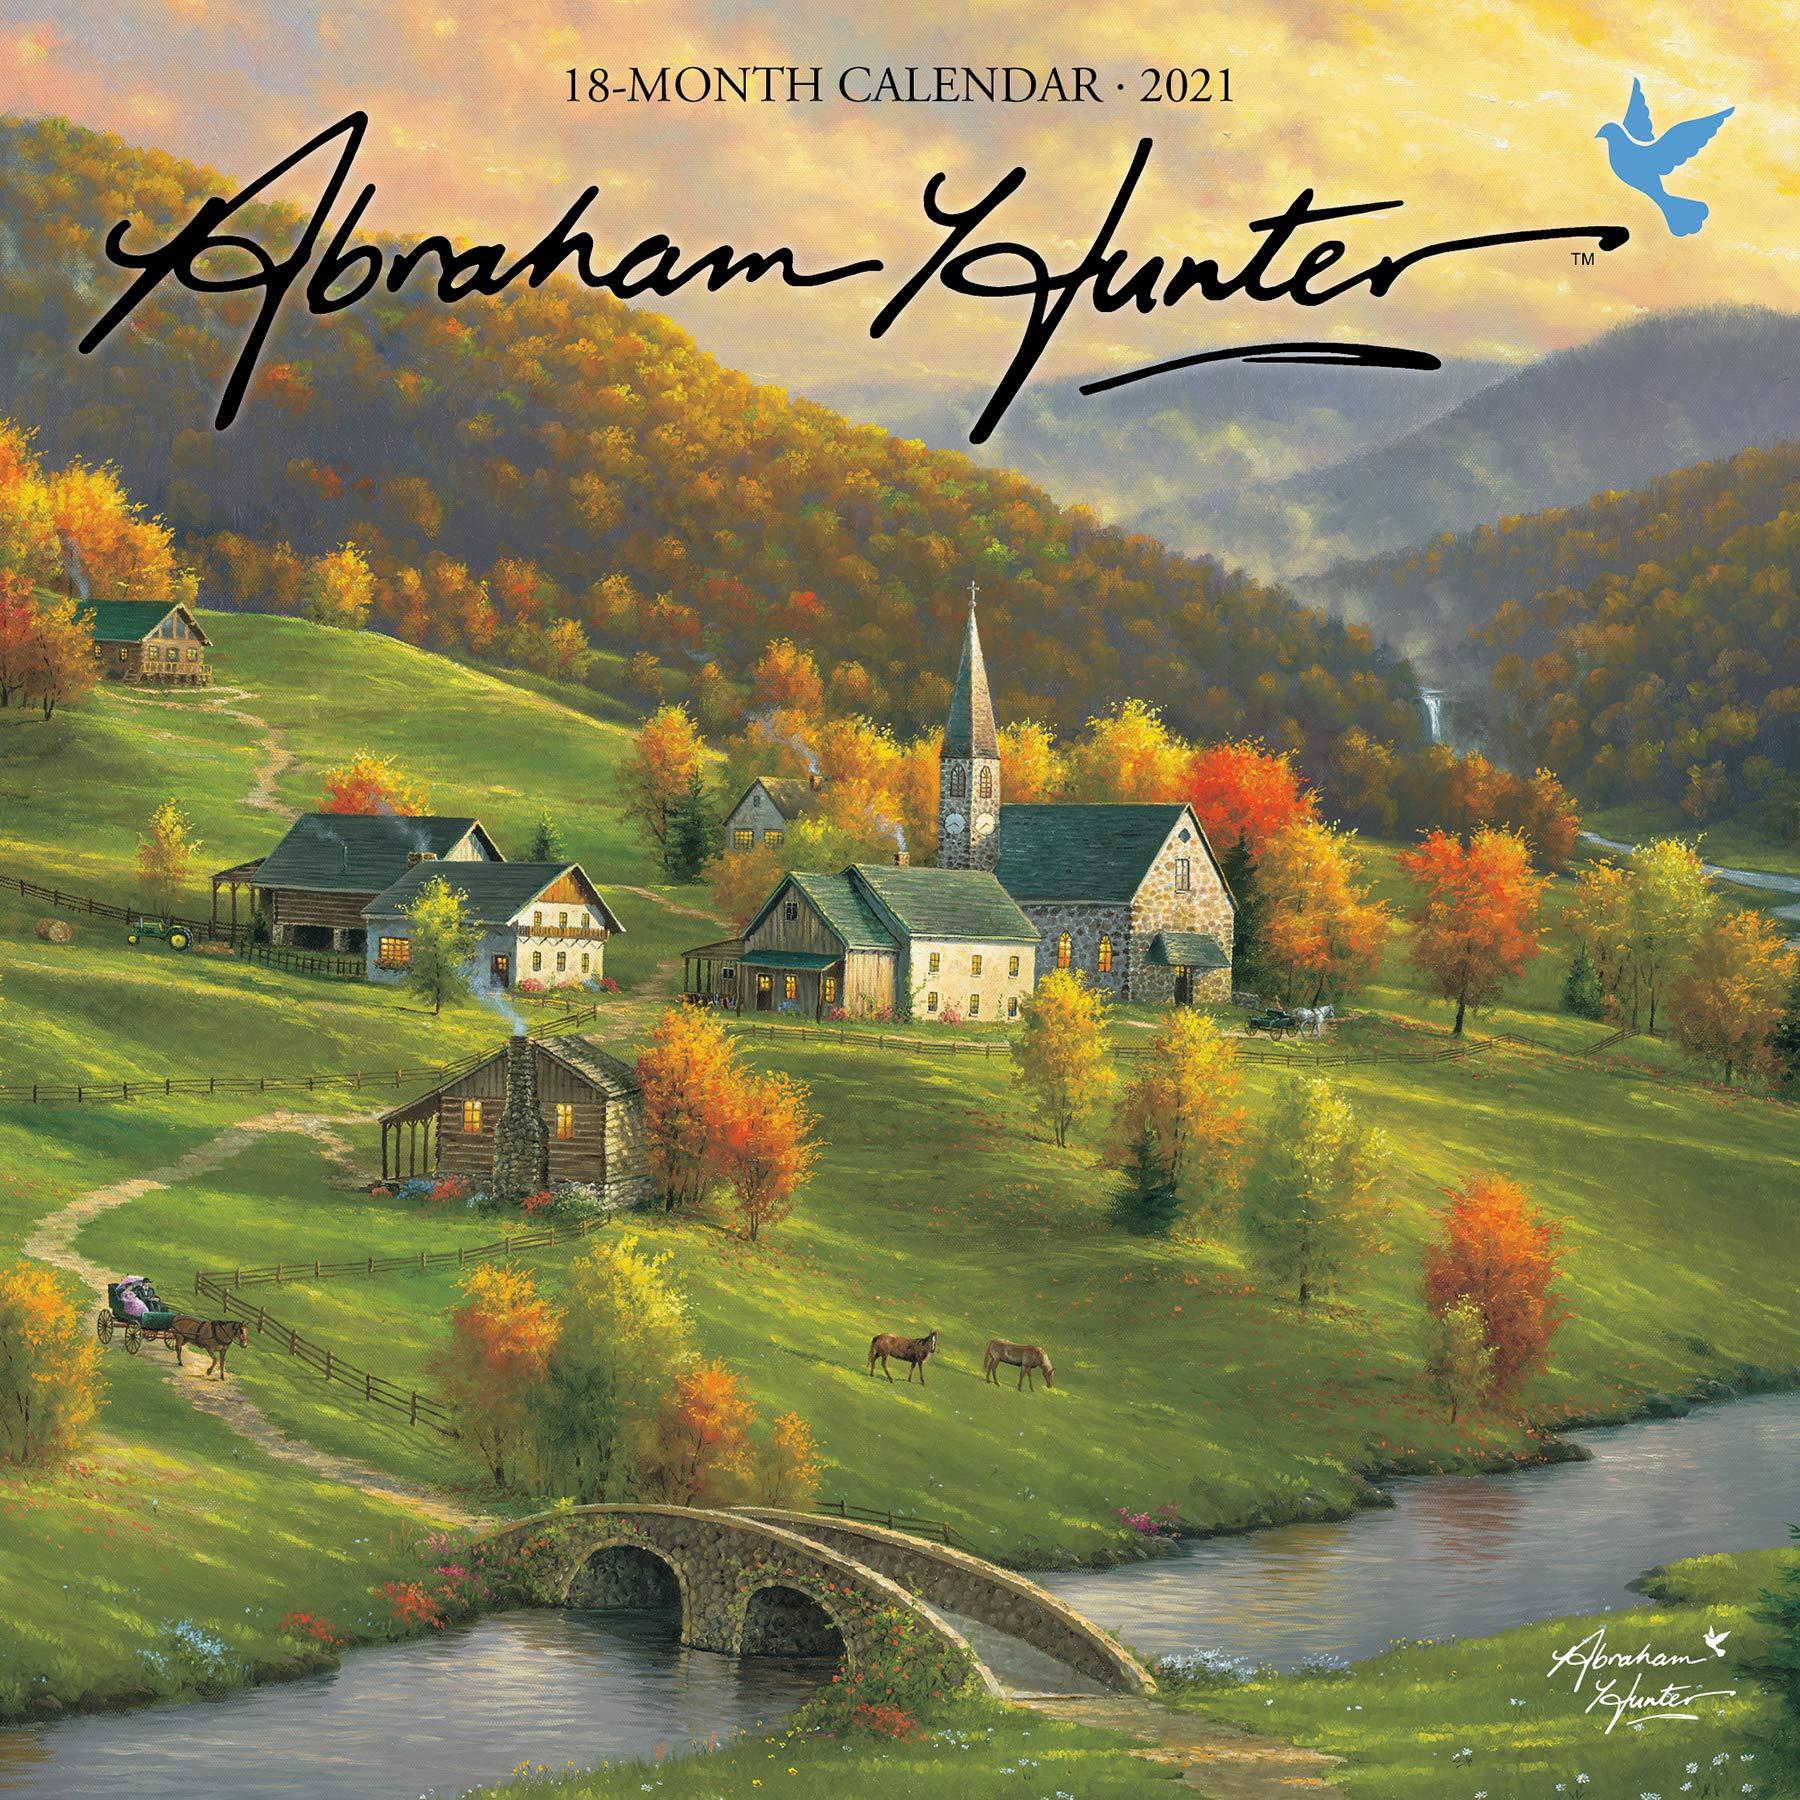 Hunter Fall 2021 Calendar Abraham Hunter 2021 Calendar: Hunter, Abraham: 9781645911654